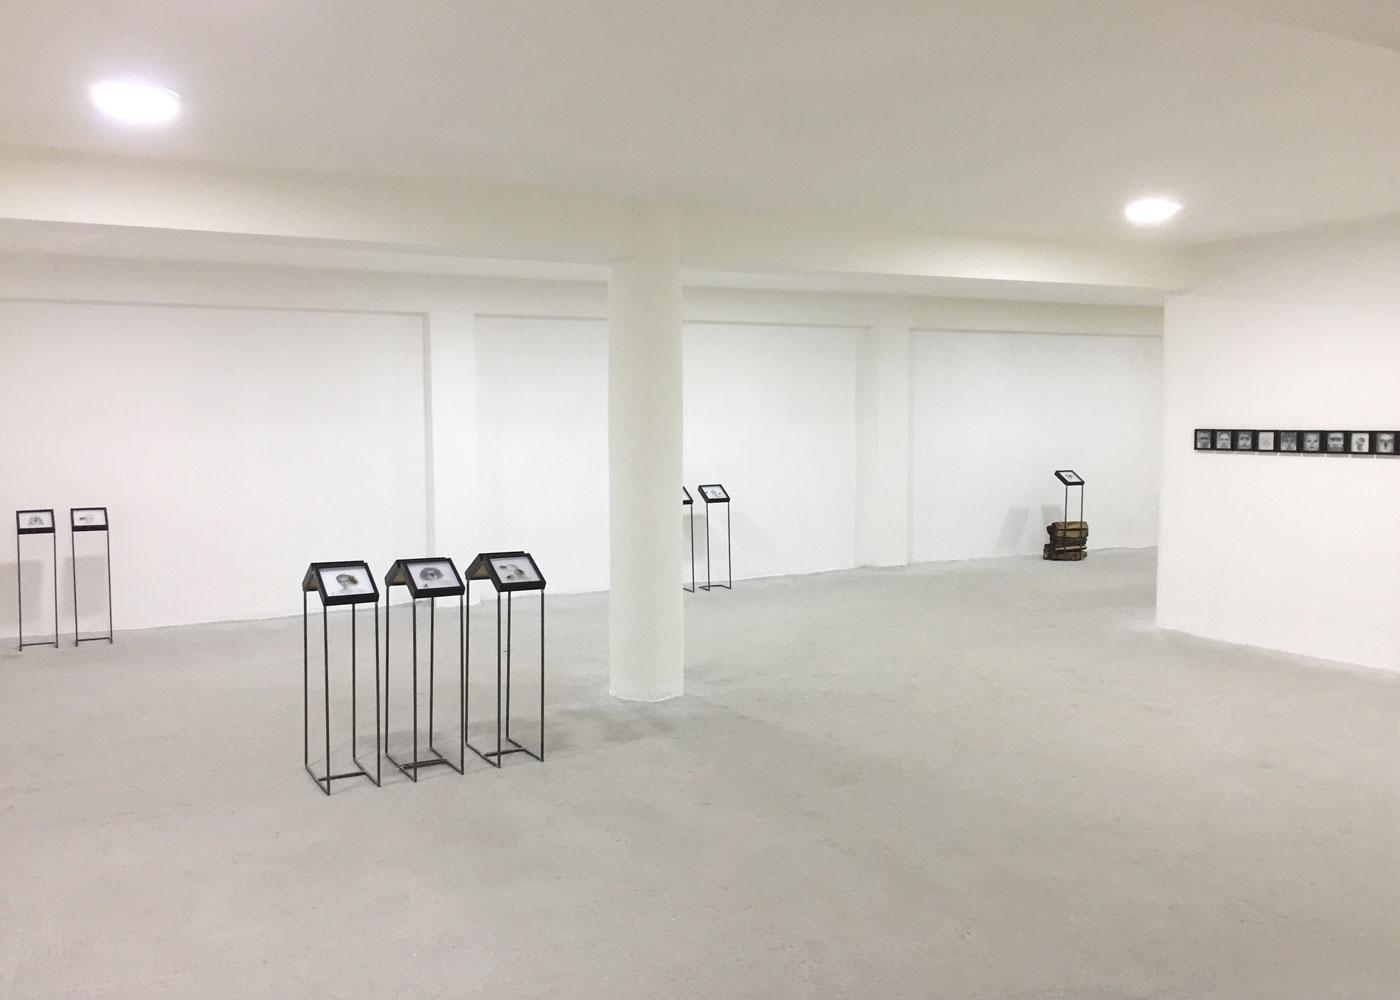 BUG (serie in vitro), 2018, installation view